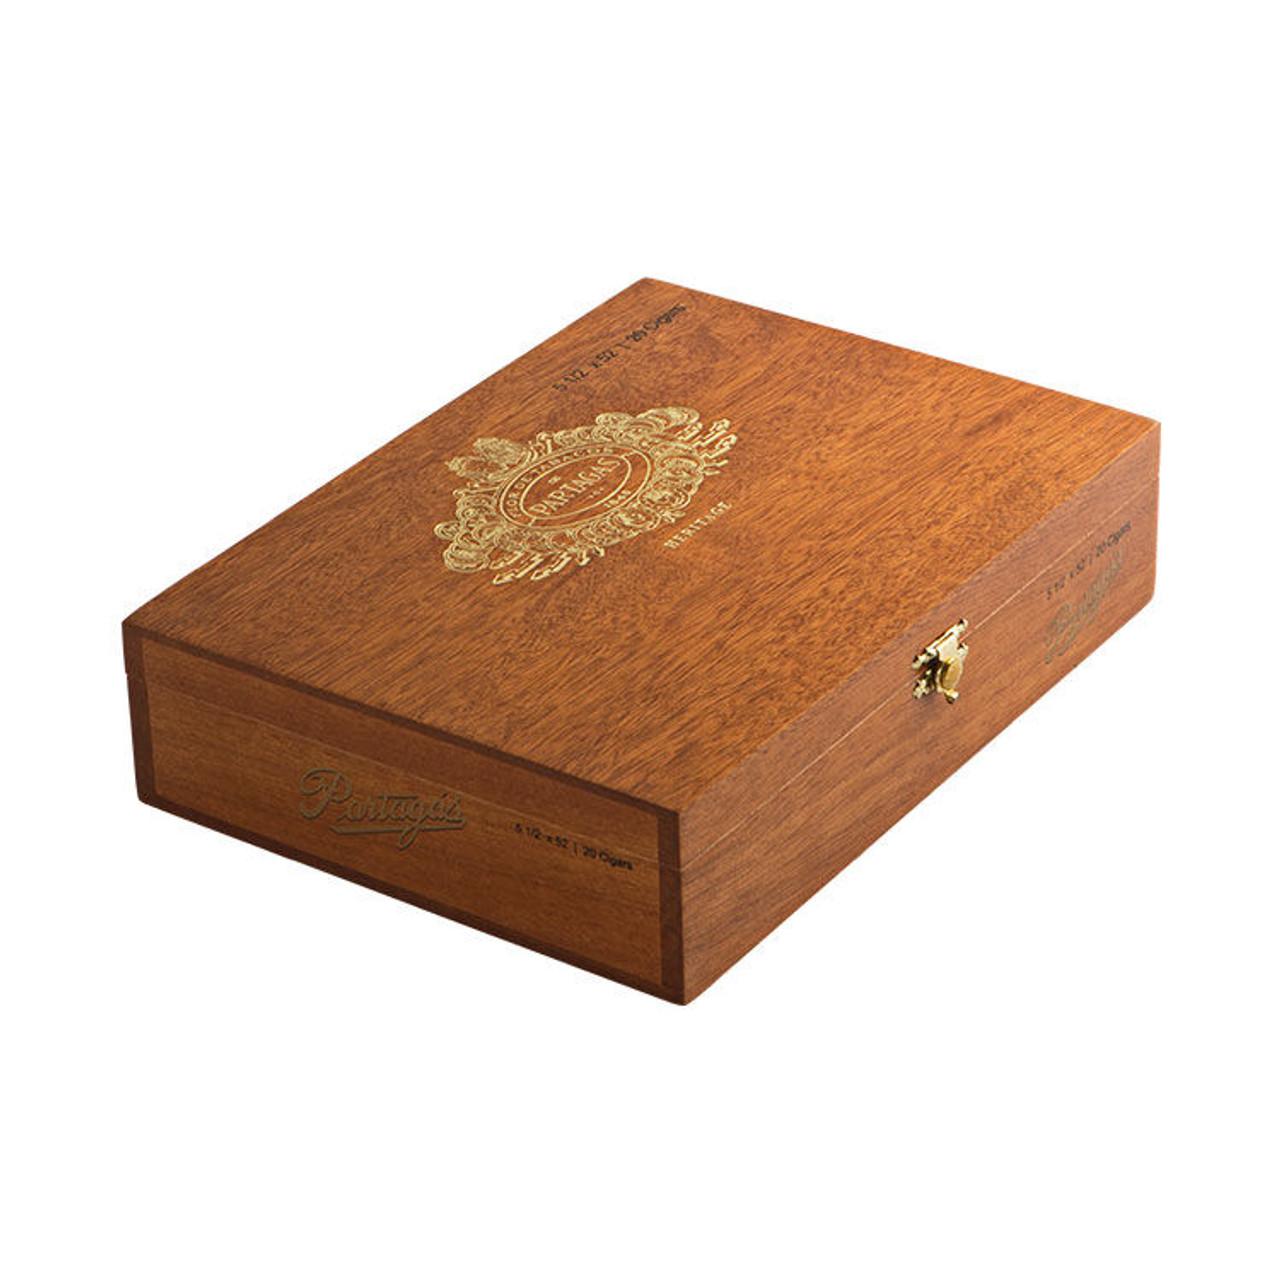 Partagas Heritage Churchill Cigars - 7.0 x 49 (Box of 20)